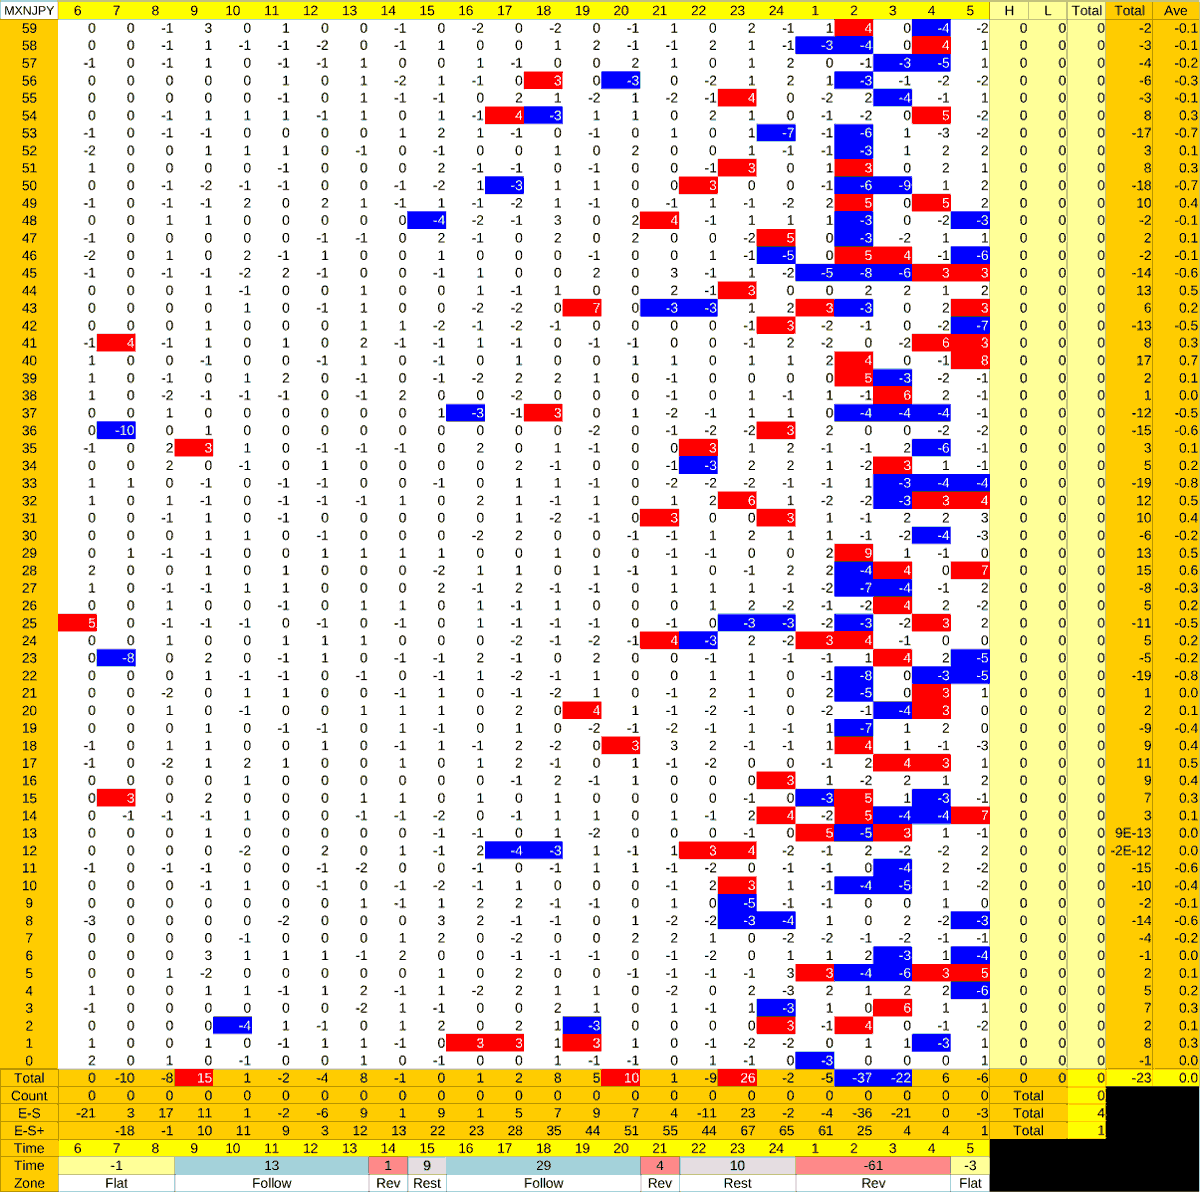 20210304_HS(3)MXNJPY